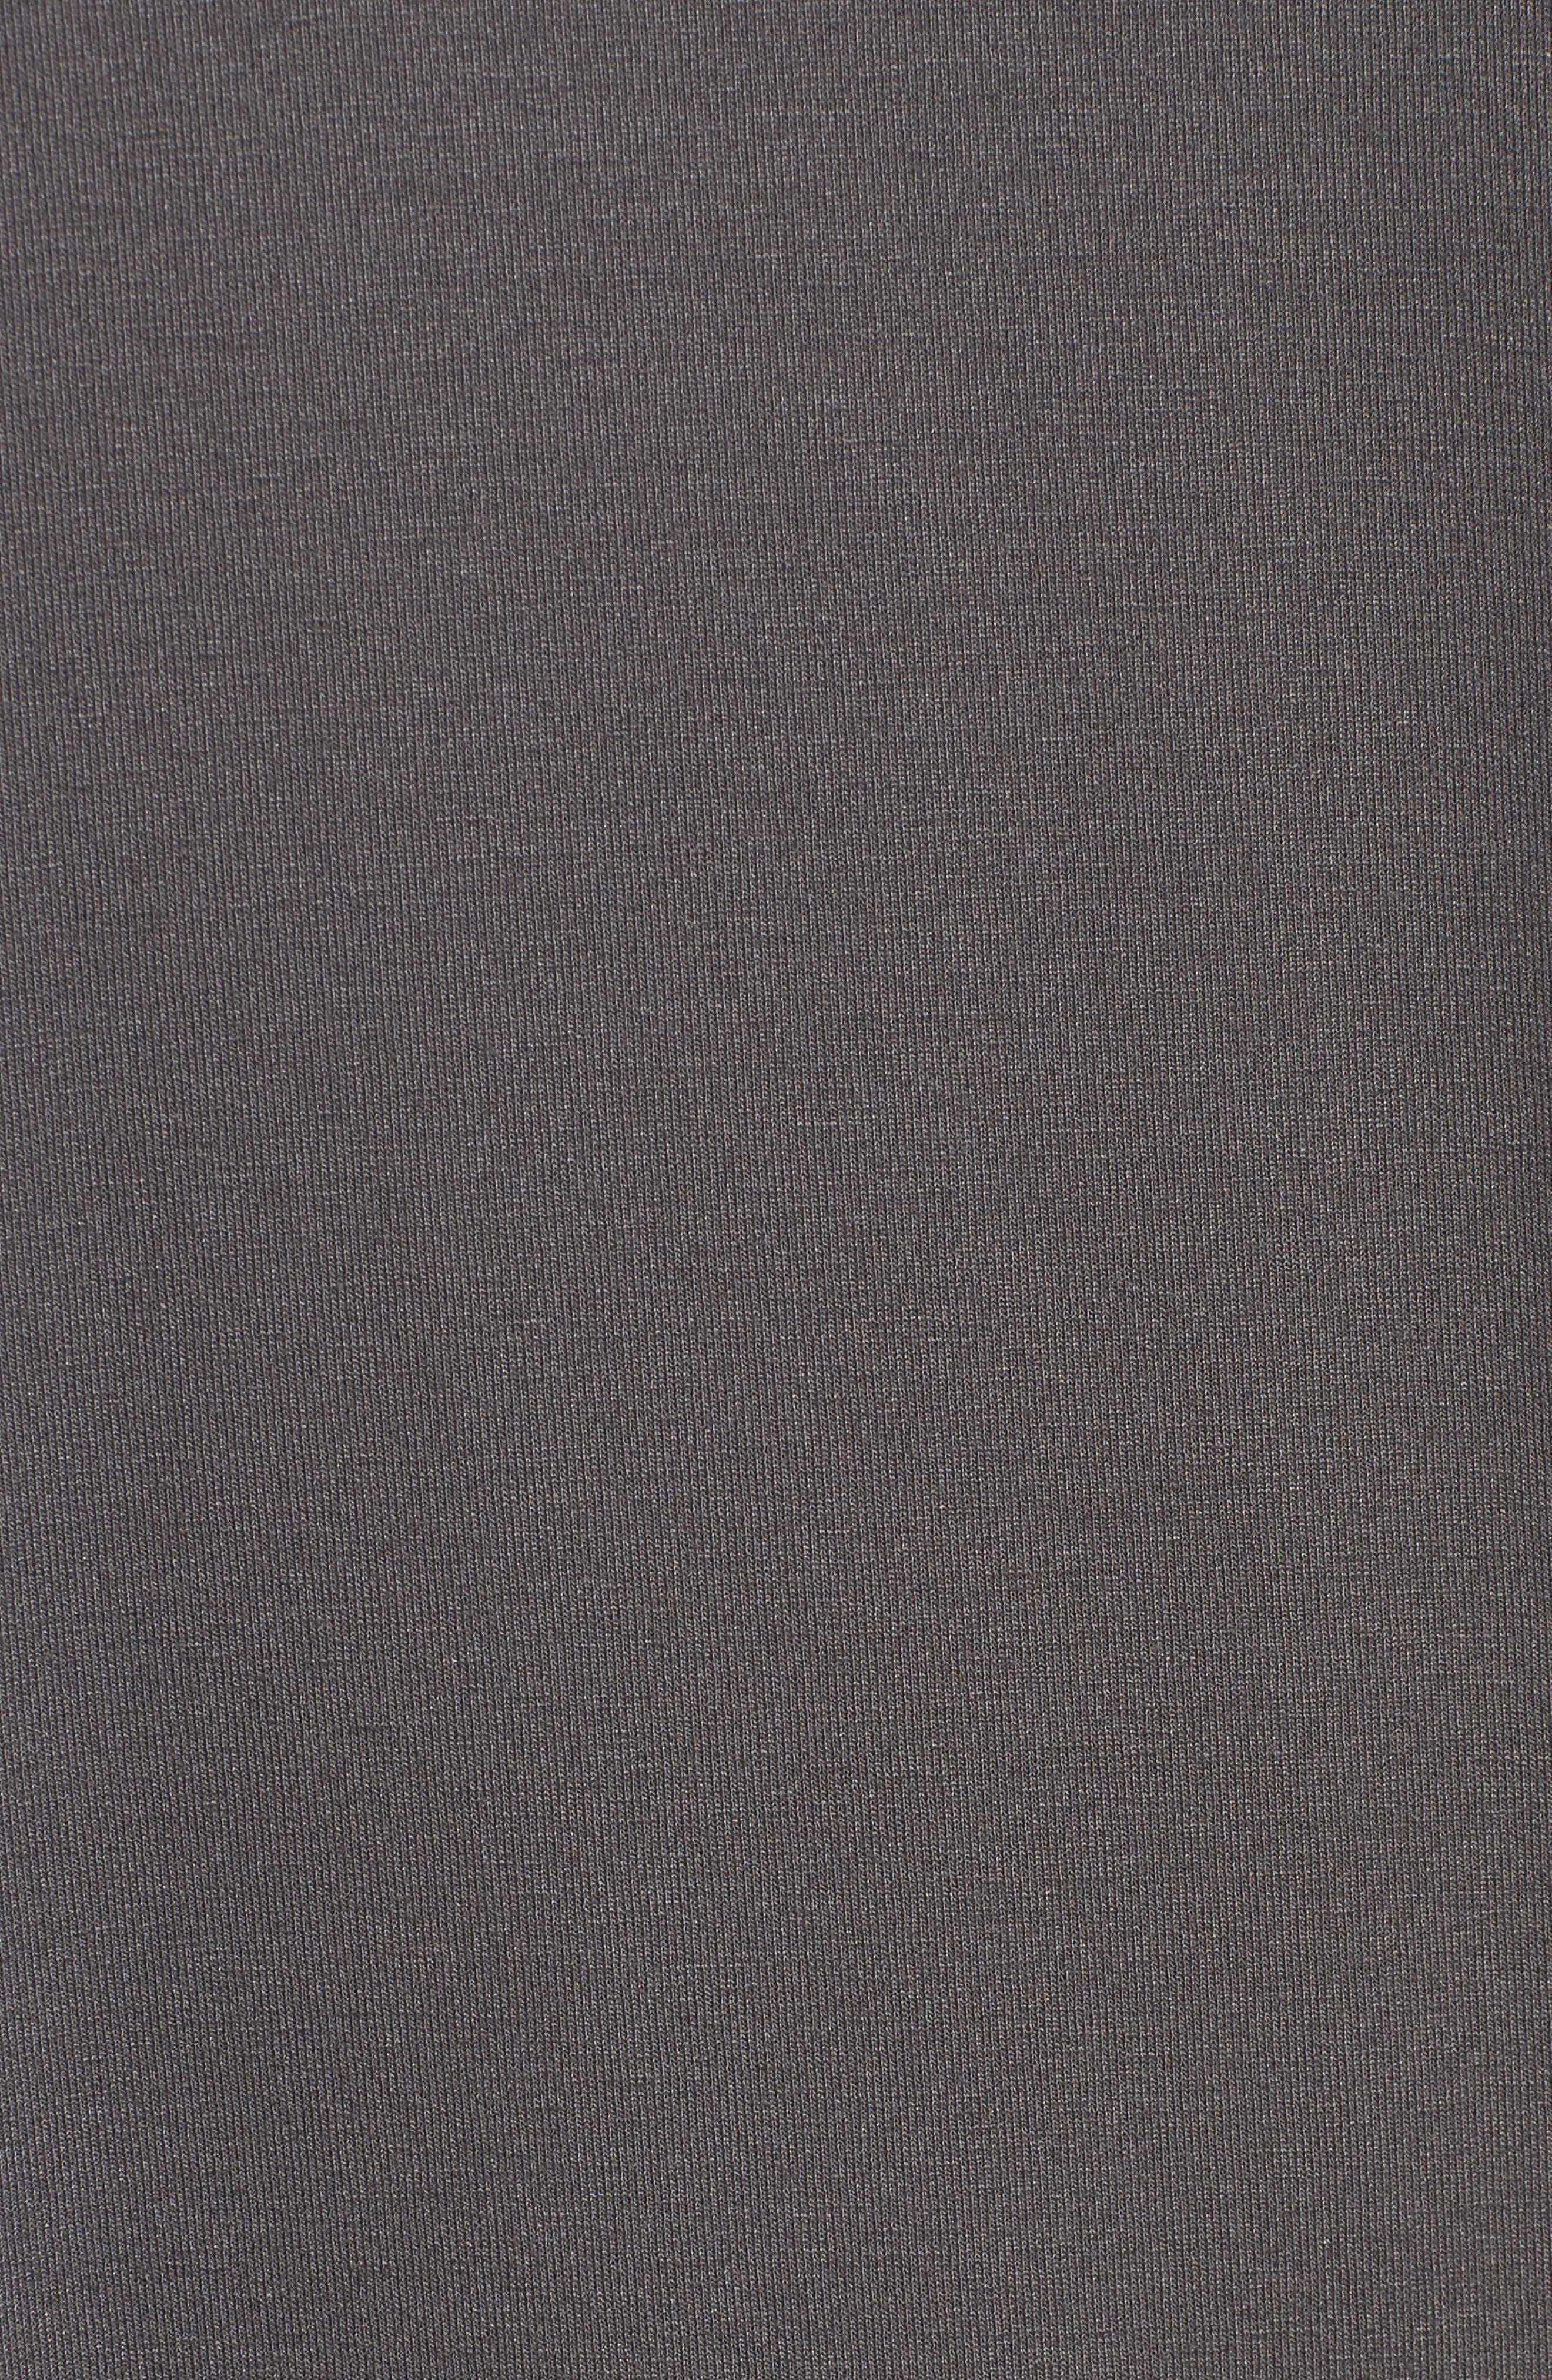 Jersey Asymmetrical A-Line Dress,                             Alternate thumbnail 22, color,